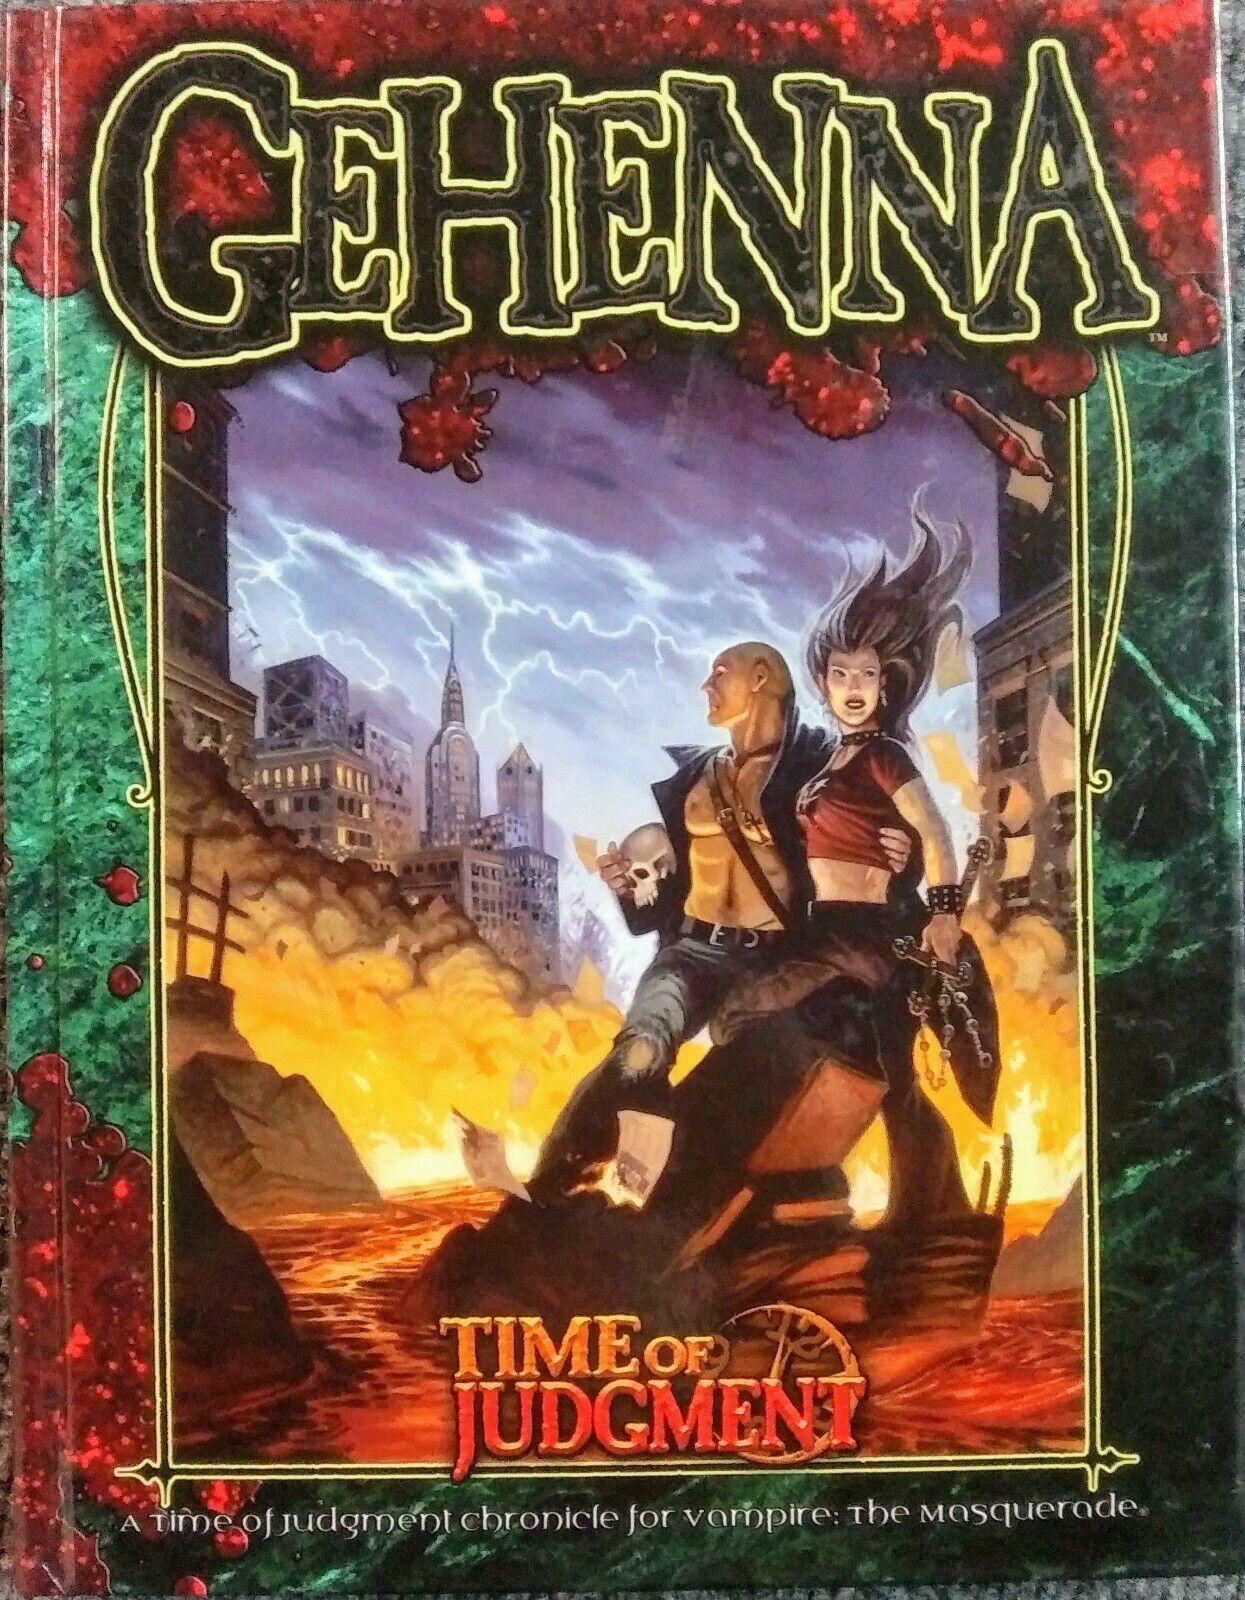 Vampire the Masquerade  Gehenna Time of Judgement Hardcover New RPG White Wolf